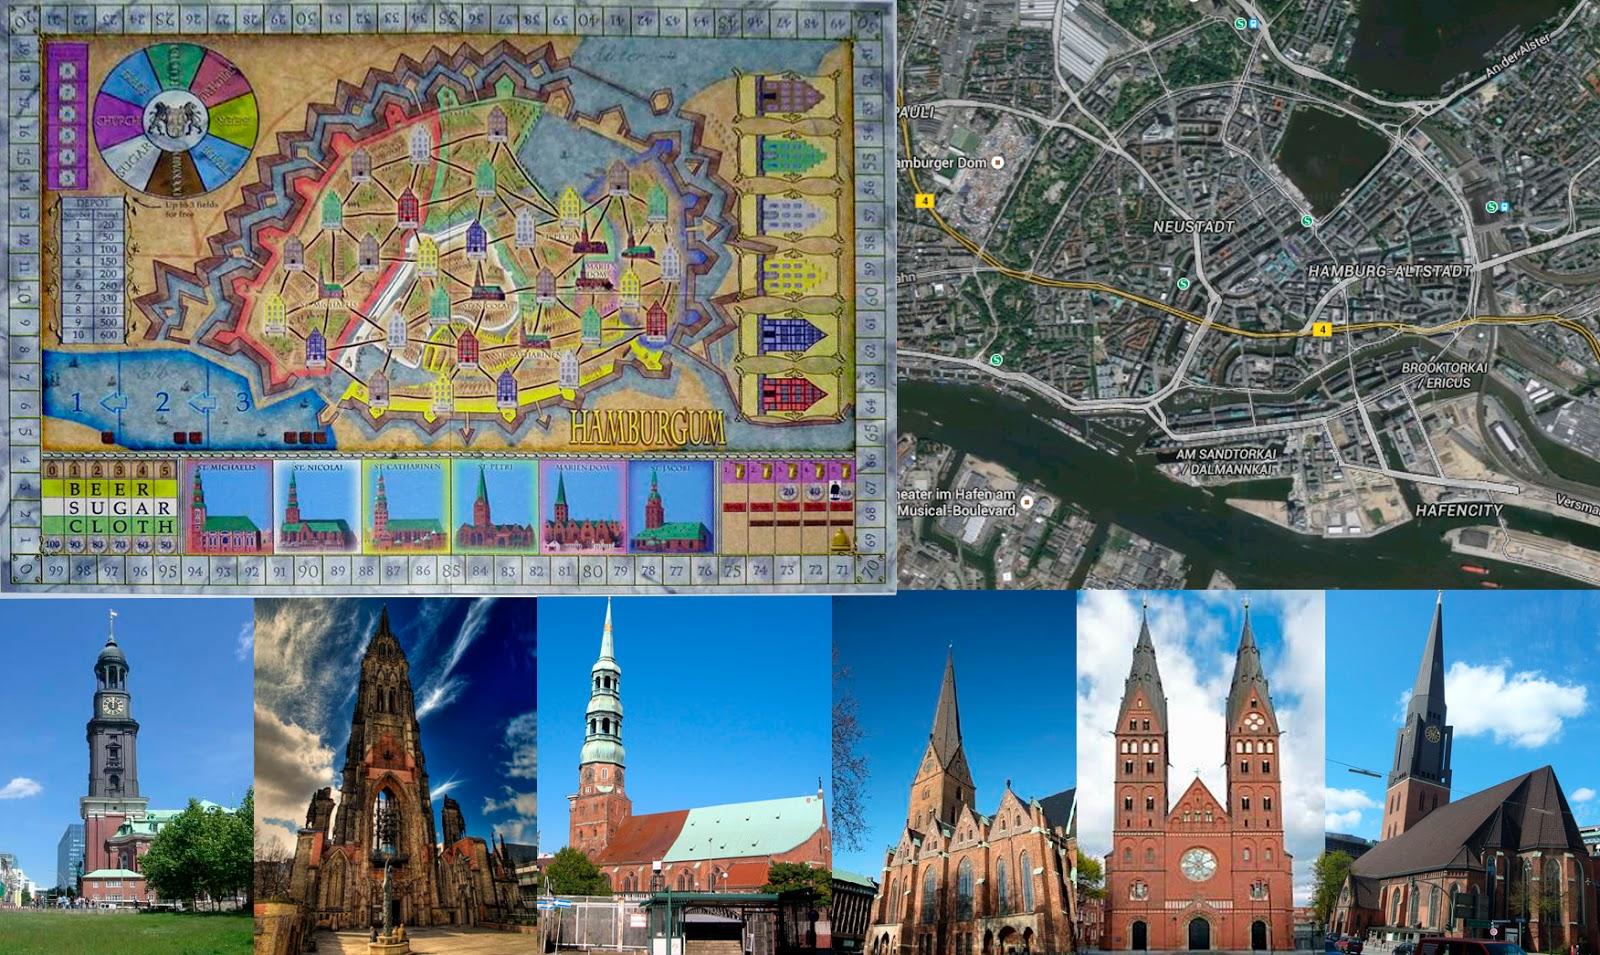 Tablero de Hamburgum - Mapa de Hamburgo - Iglesia de San Miguel - Iglesia de San Nicolás - Iglesia de Santa Catalina - Iglesia de San Pedro - Catedral Santa María - Iglesia de San Jacobo